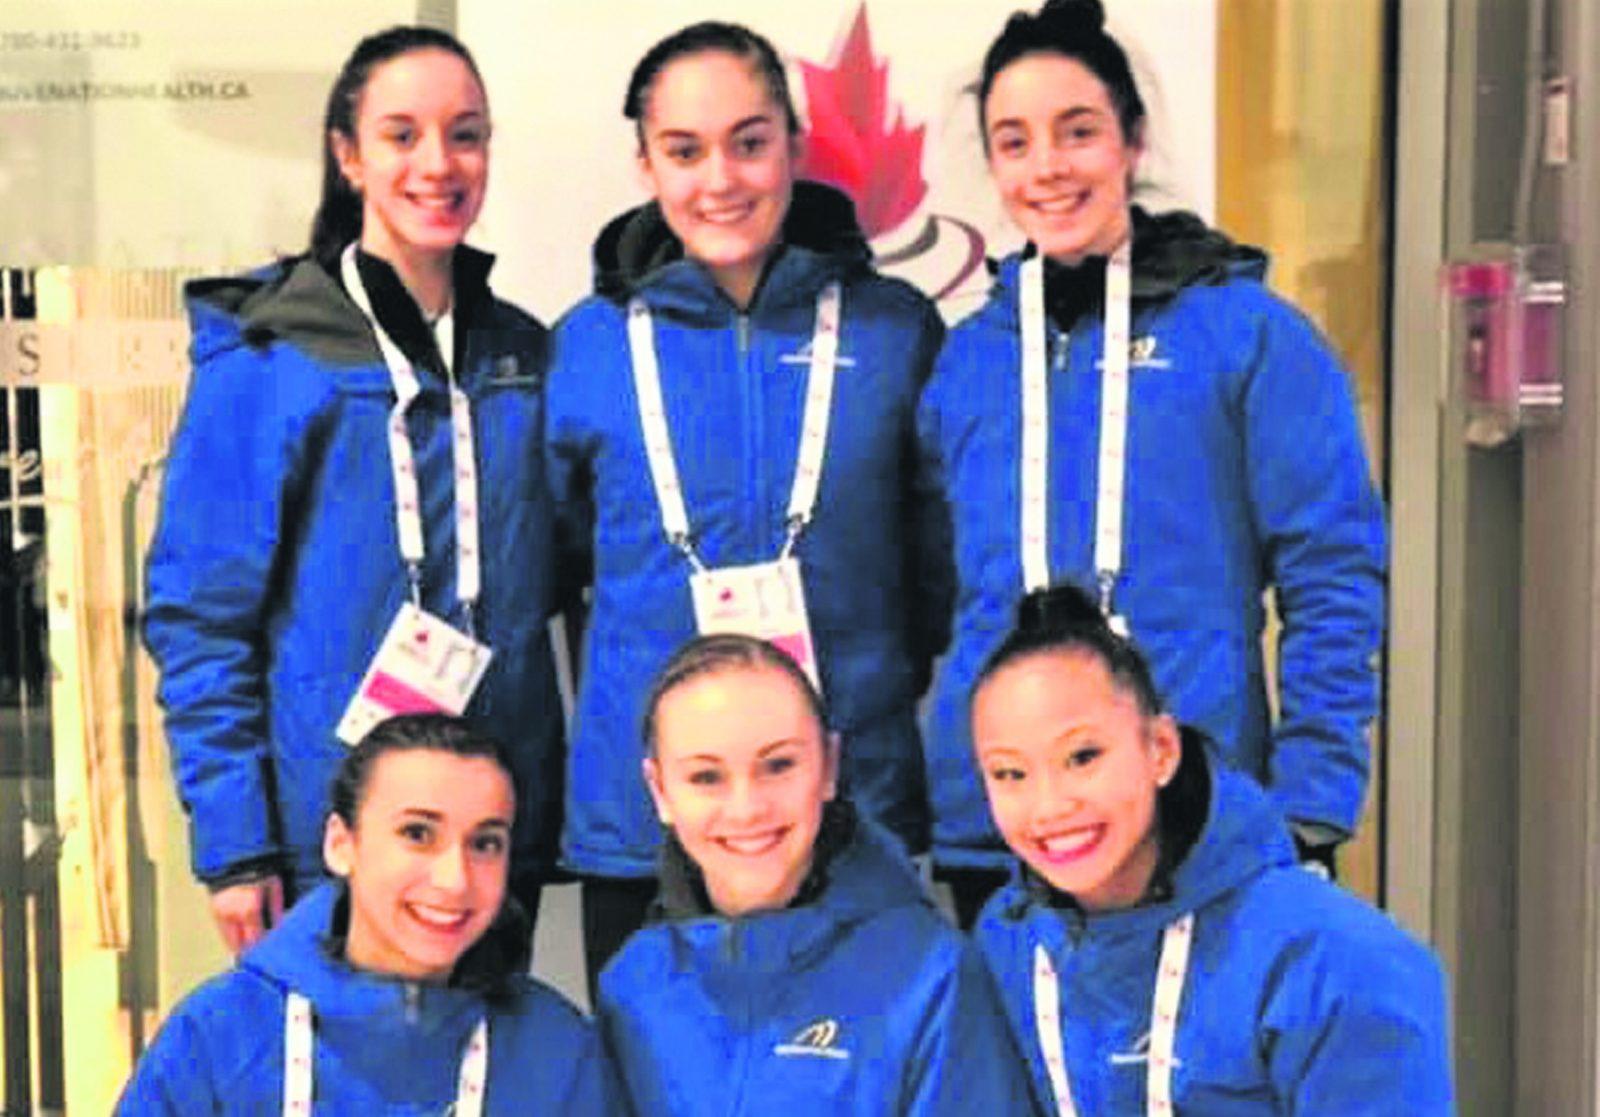 Six patineuses au Défi Patinage Canada